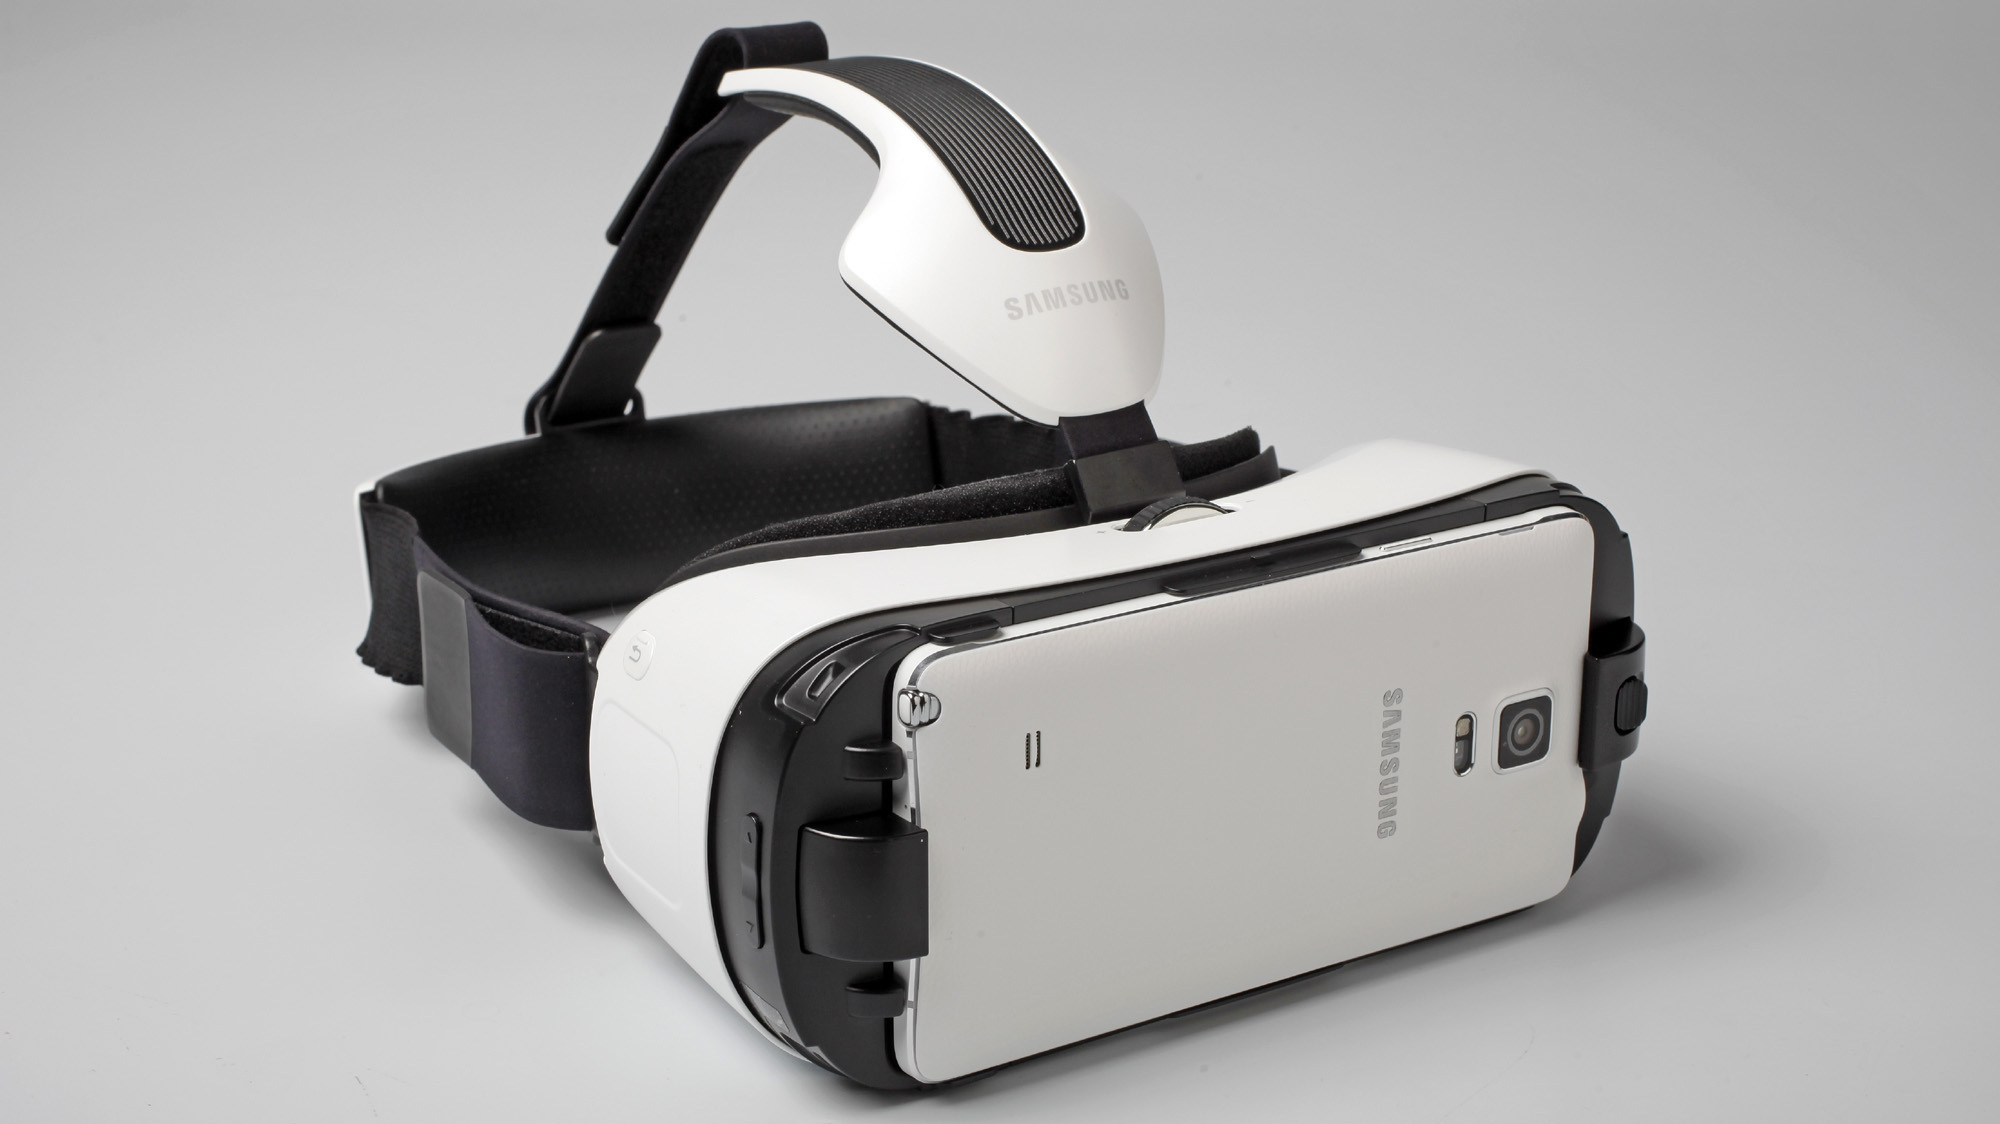 samsung gear vr ab sofort erh ltlich virtual reality brille im dauertest heise online. Black Bedroom Furniture Sets. Home Design Ideas